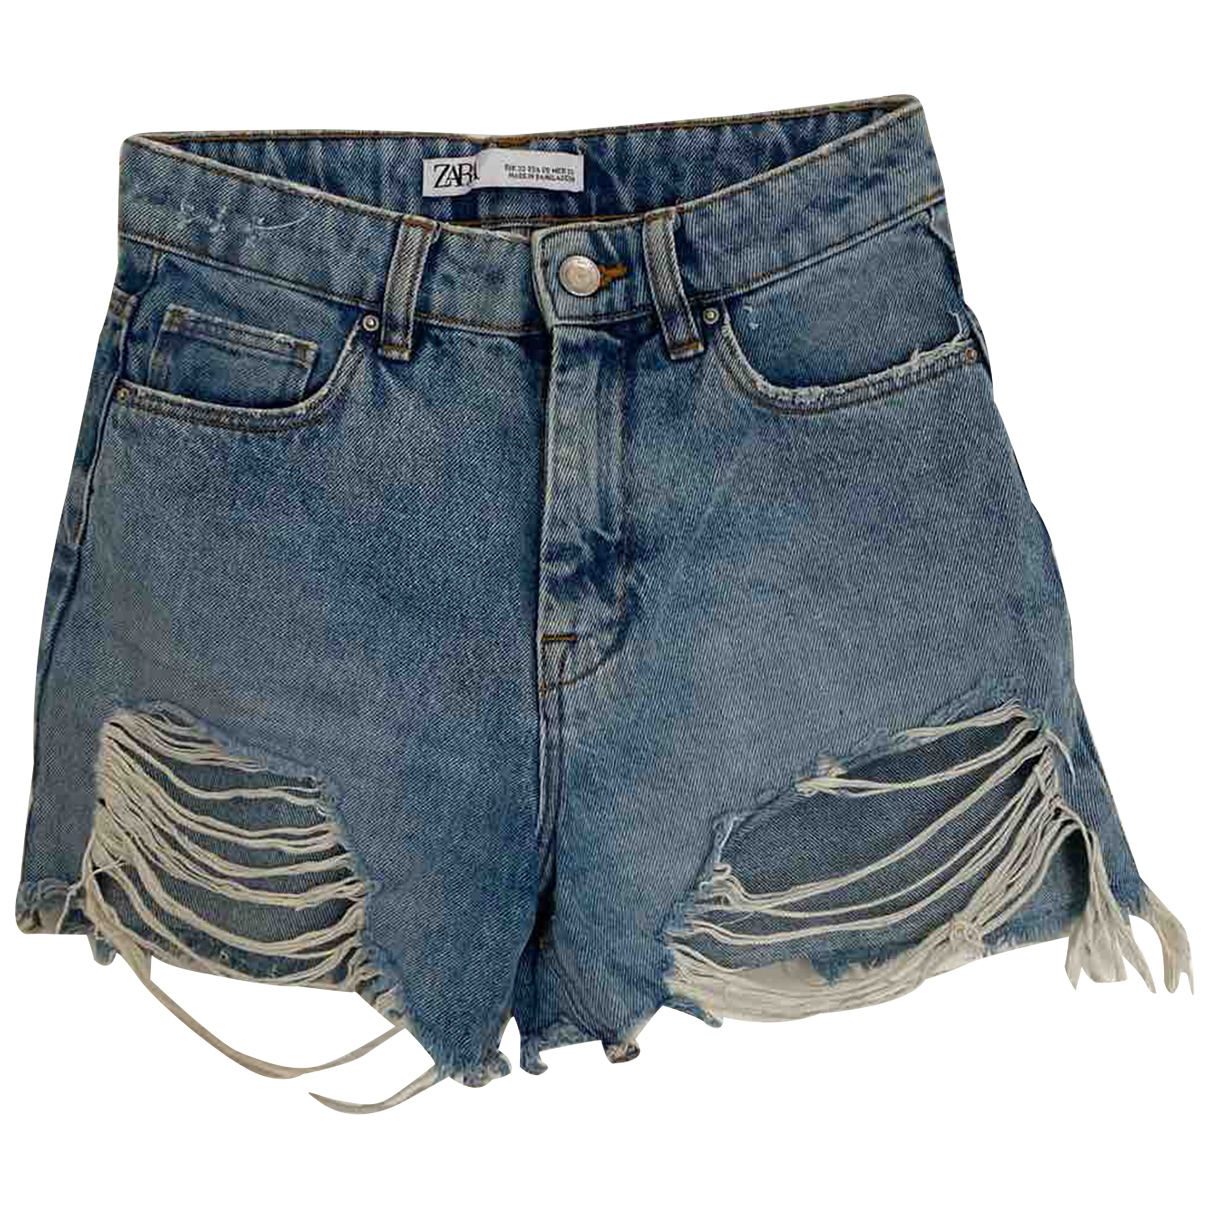 Zara N Blue Denim - Jeans Shorts for Women XS International